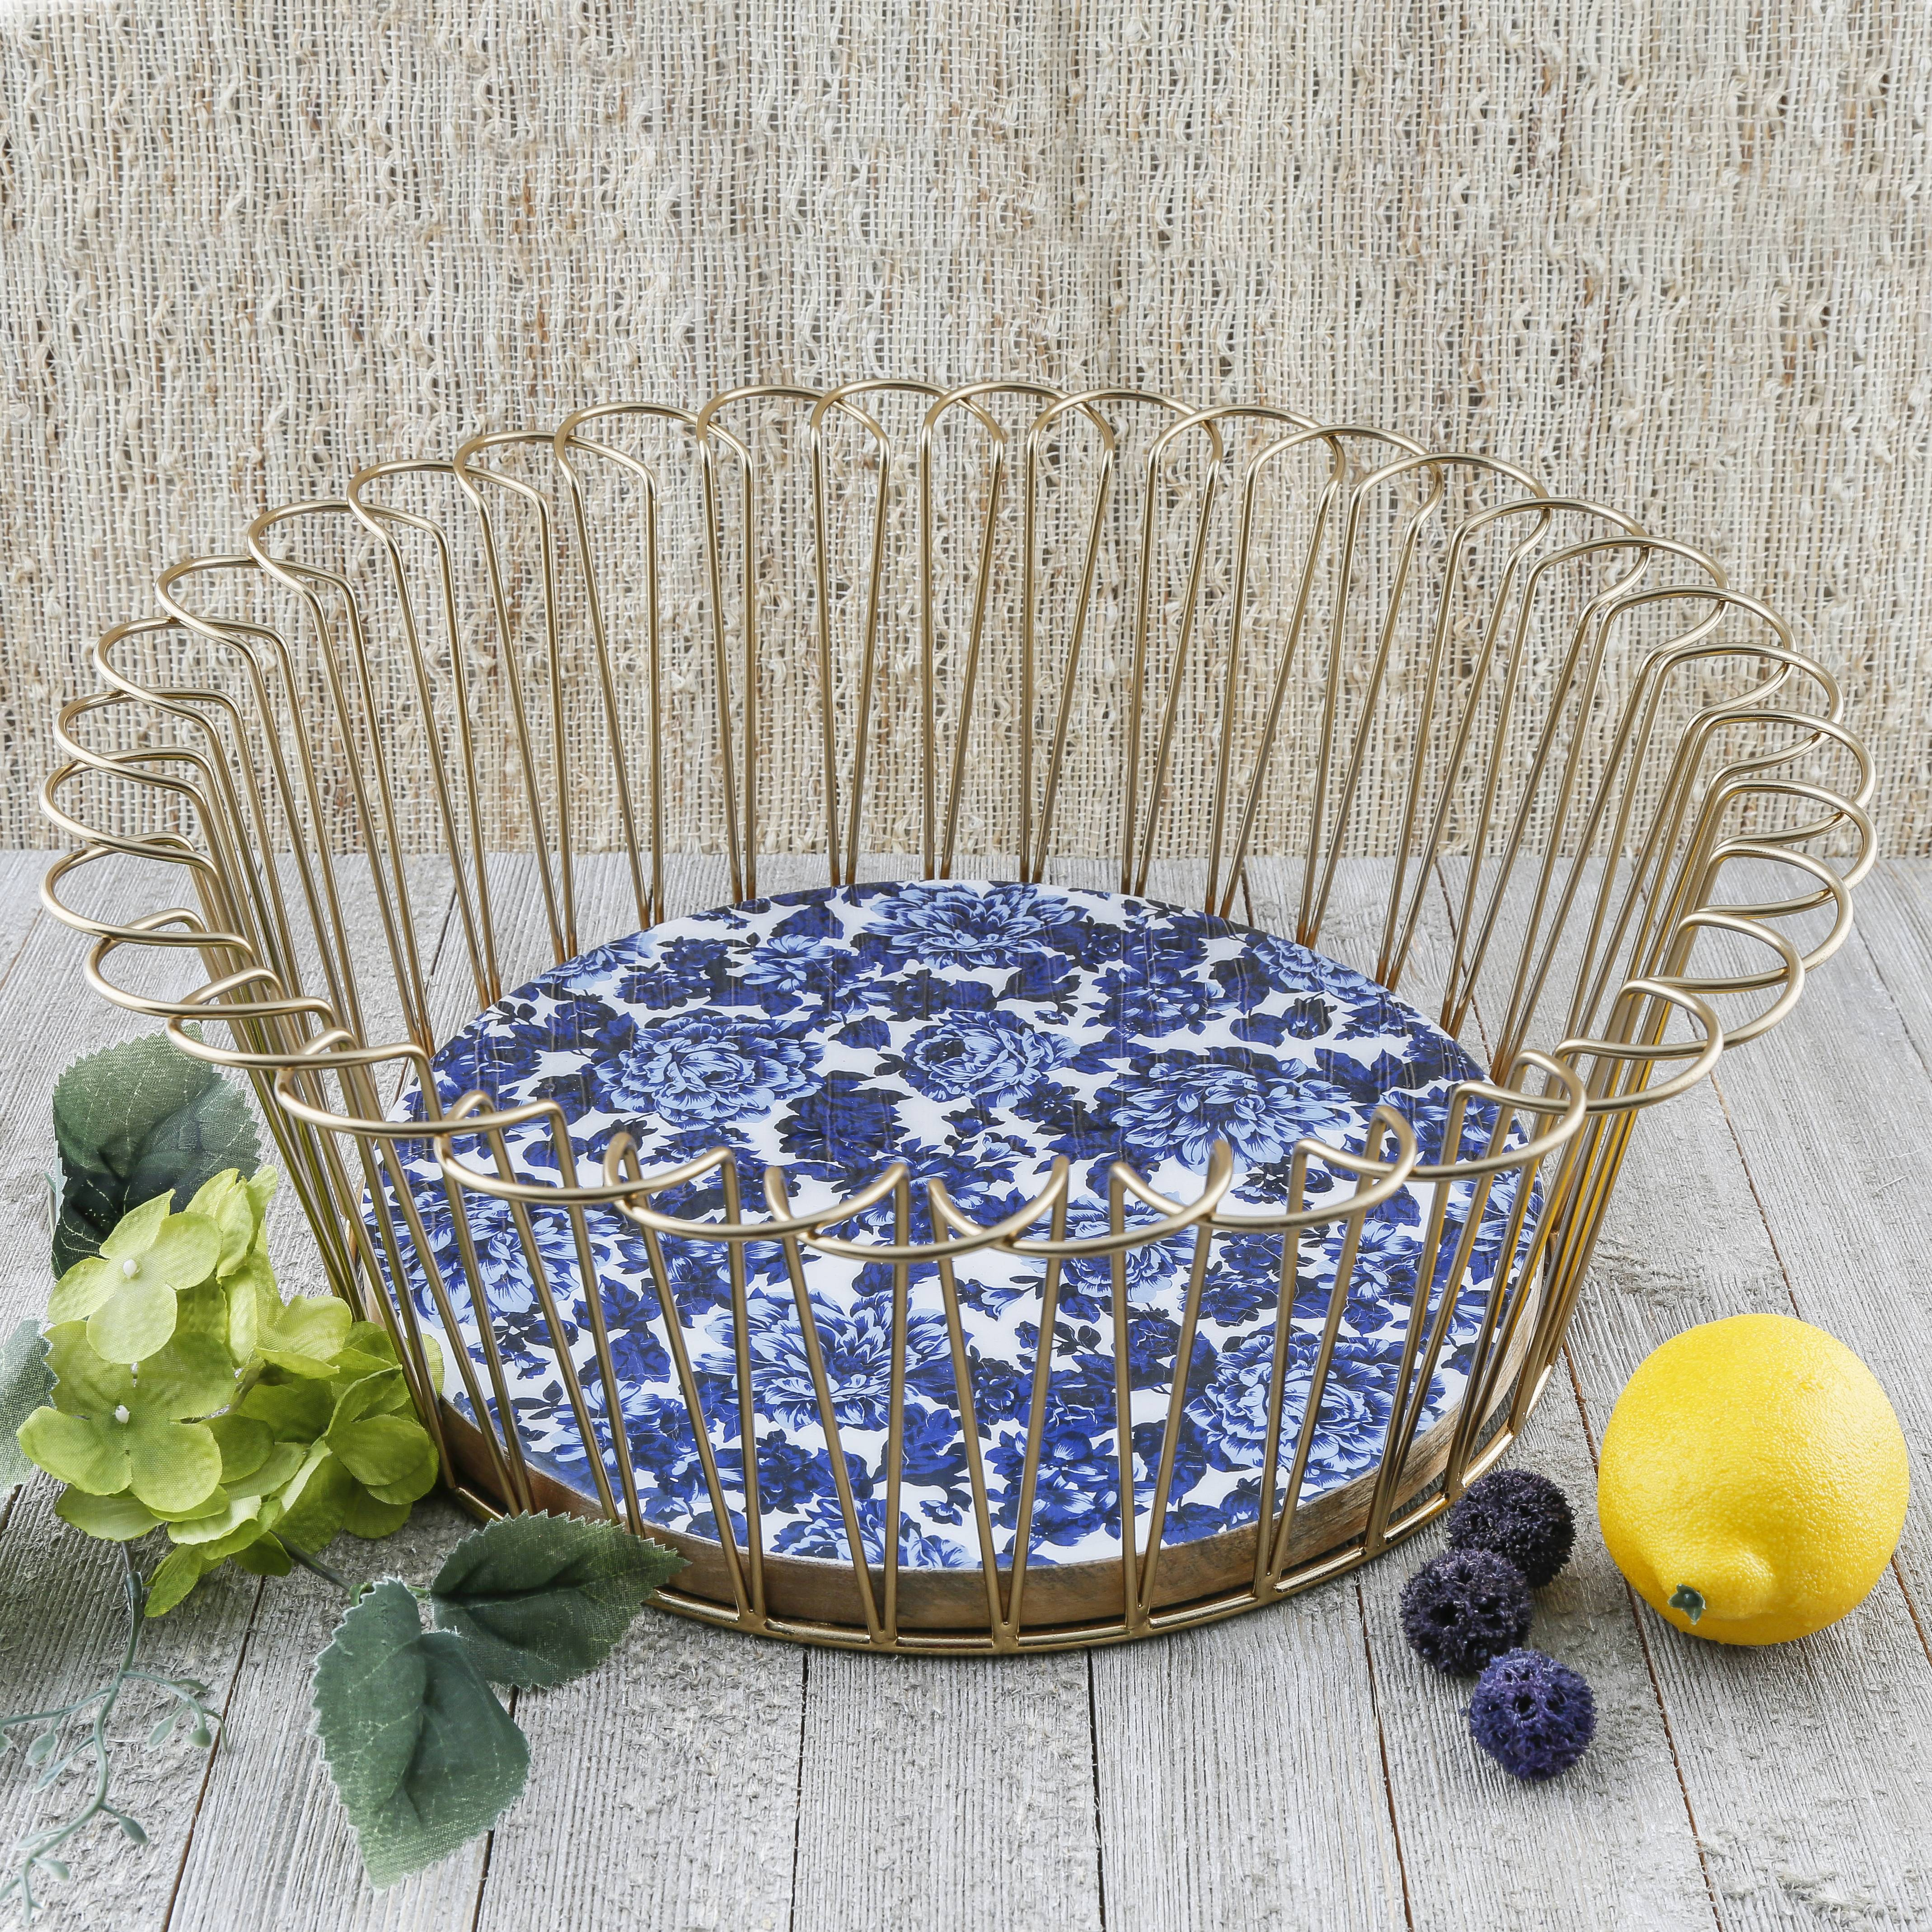 10 Small Wicker Bread Crisp Basket Dollhouse Miniatures Bakery Fruit Vegetable m